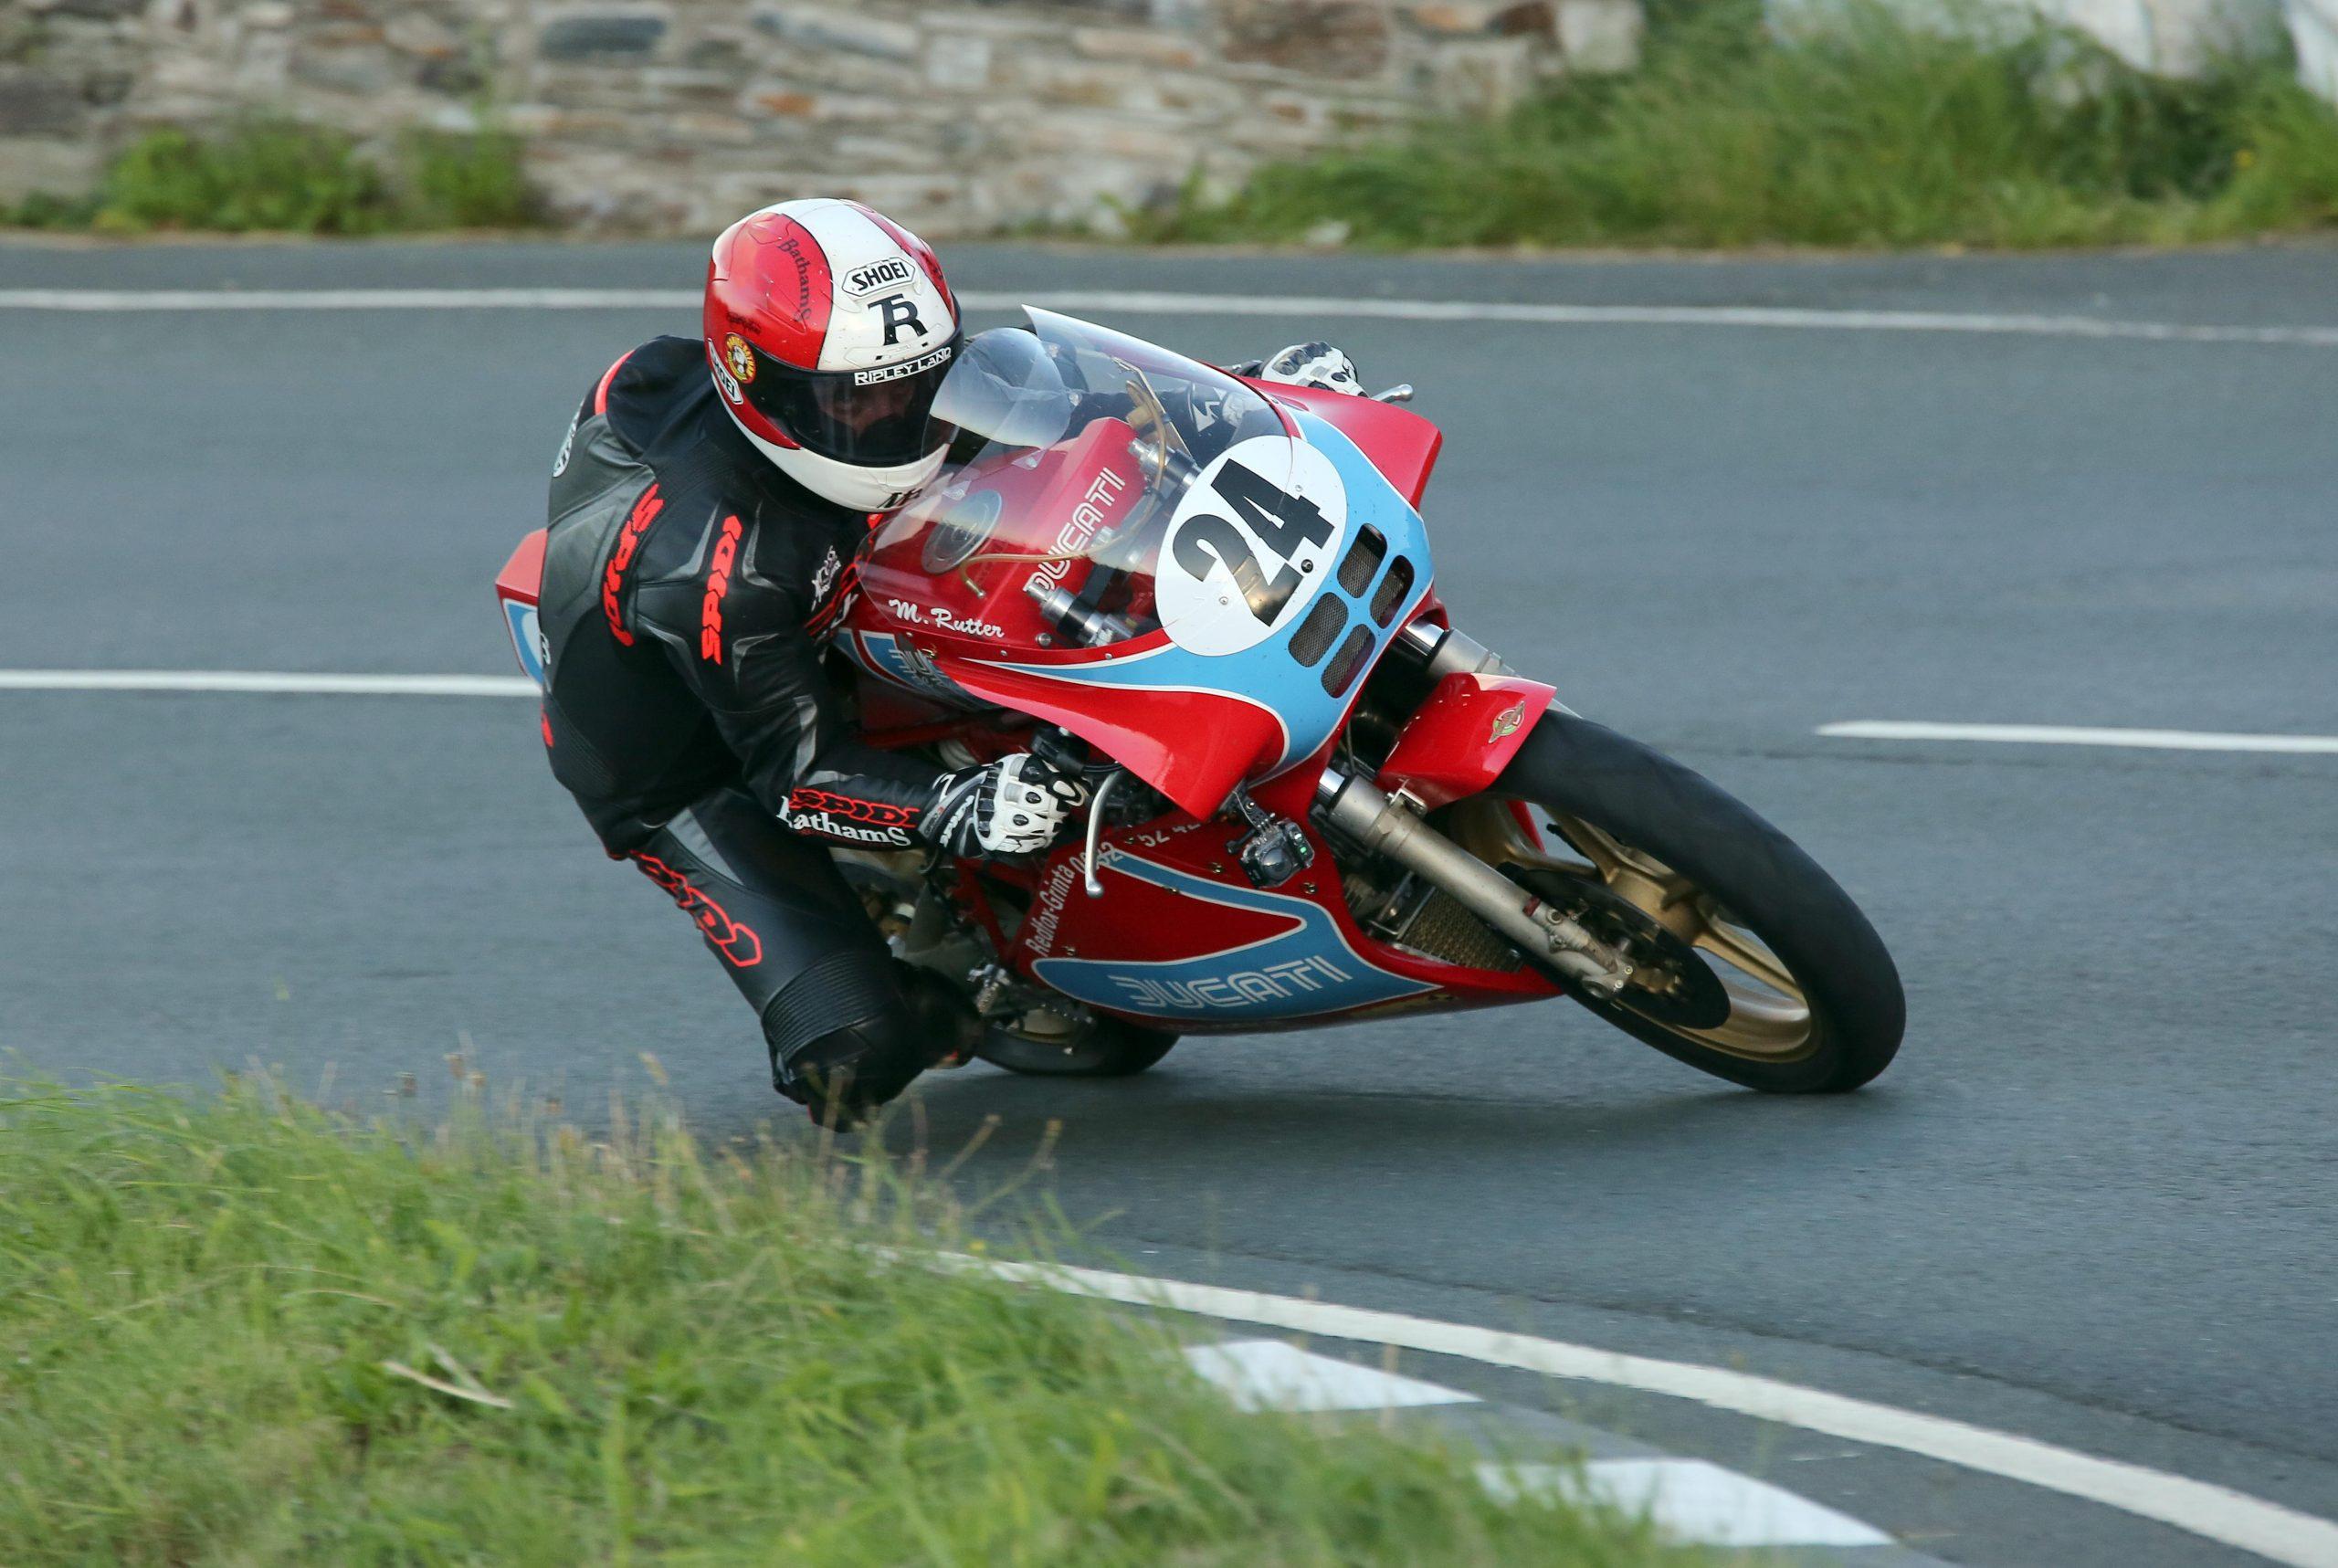 Michael Rutter motorcycle racer